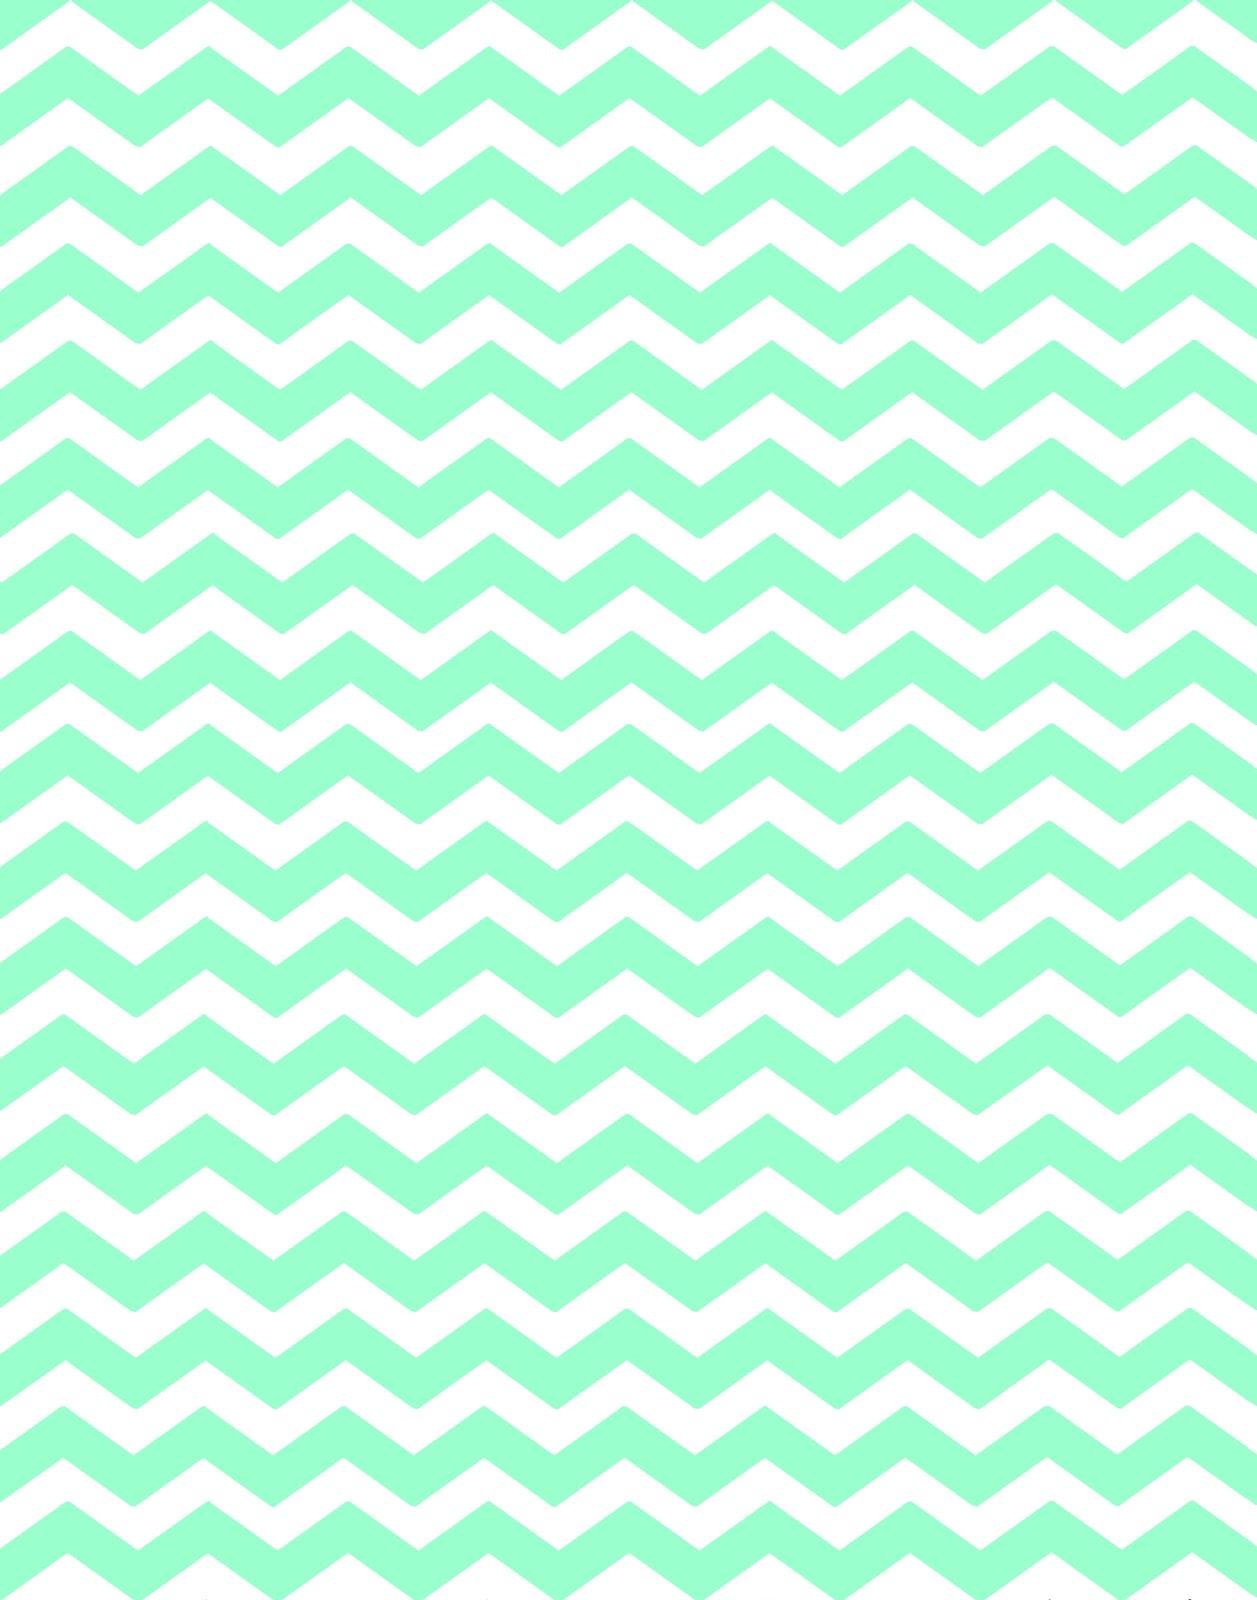 [50+] Blue and White Chevron Wallpaper on WallpaperSafari